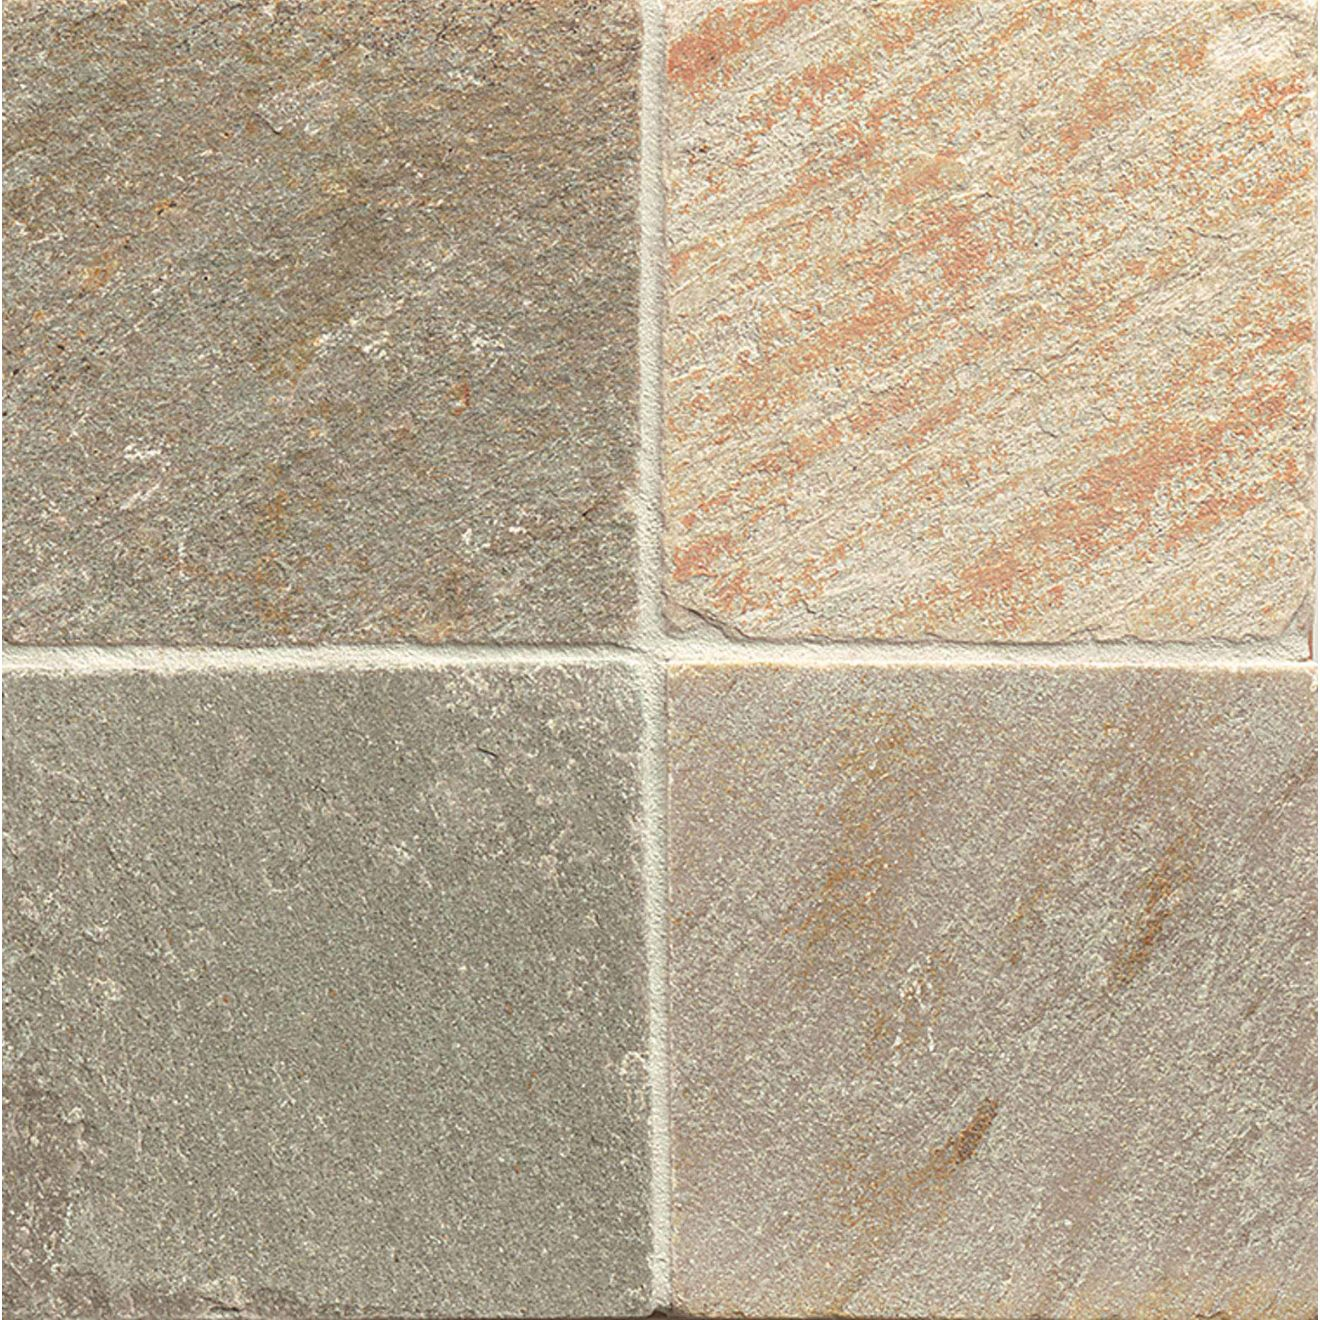 "Amber Gold 6"" x 6"" Floor & Wall Tile"